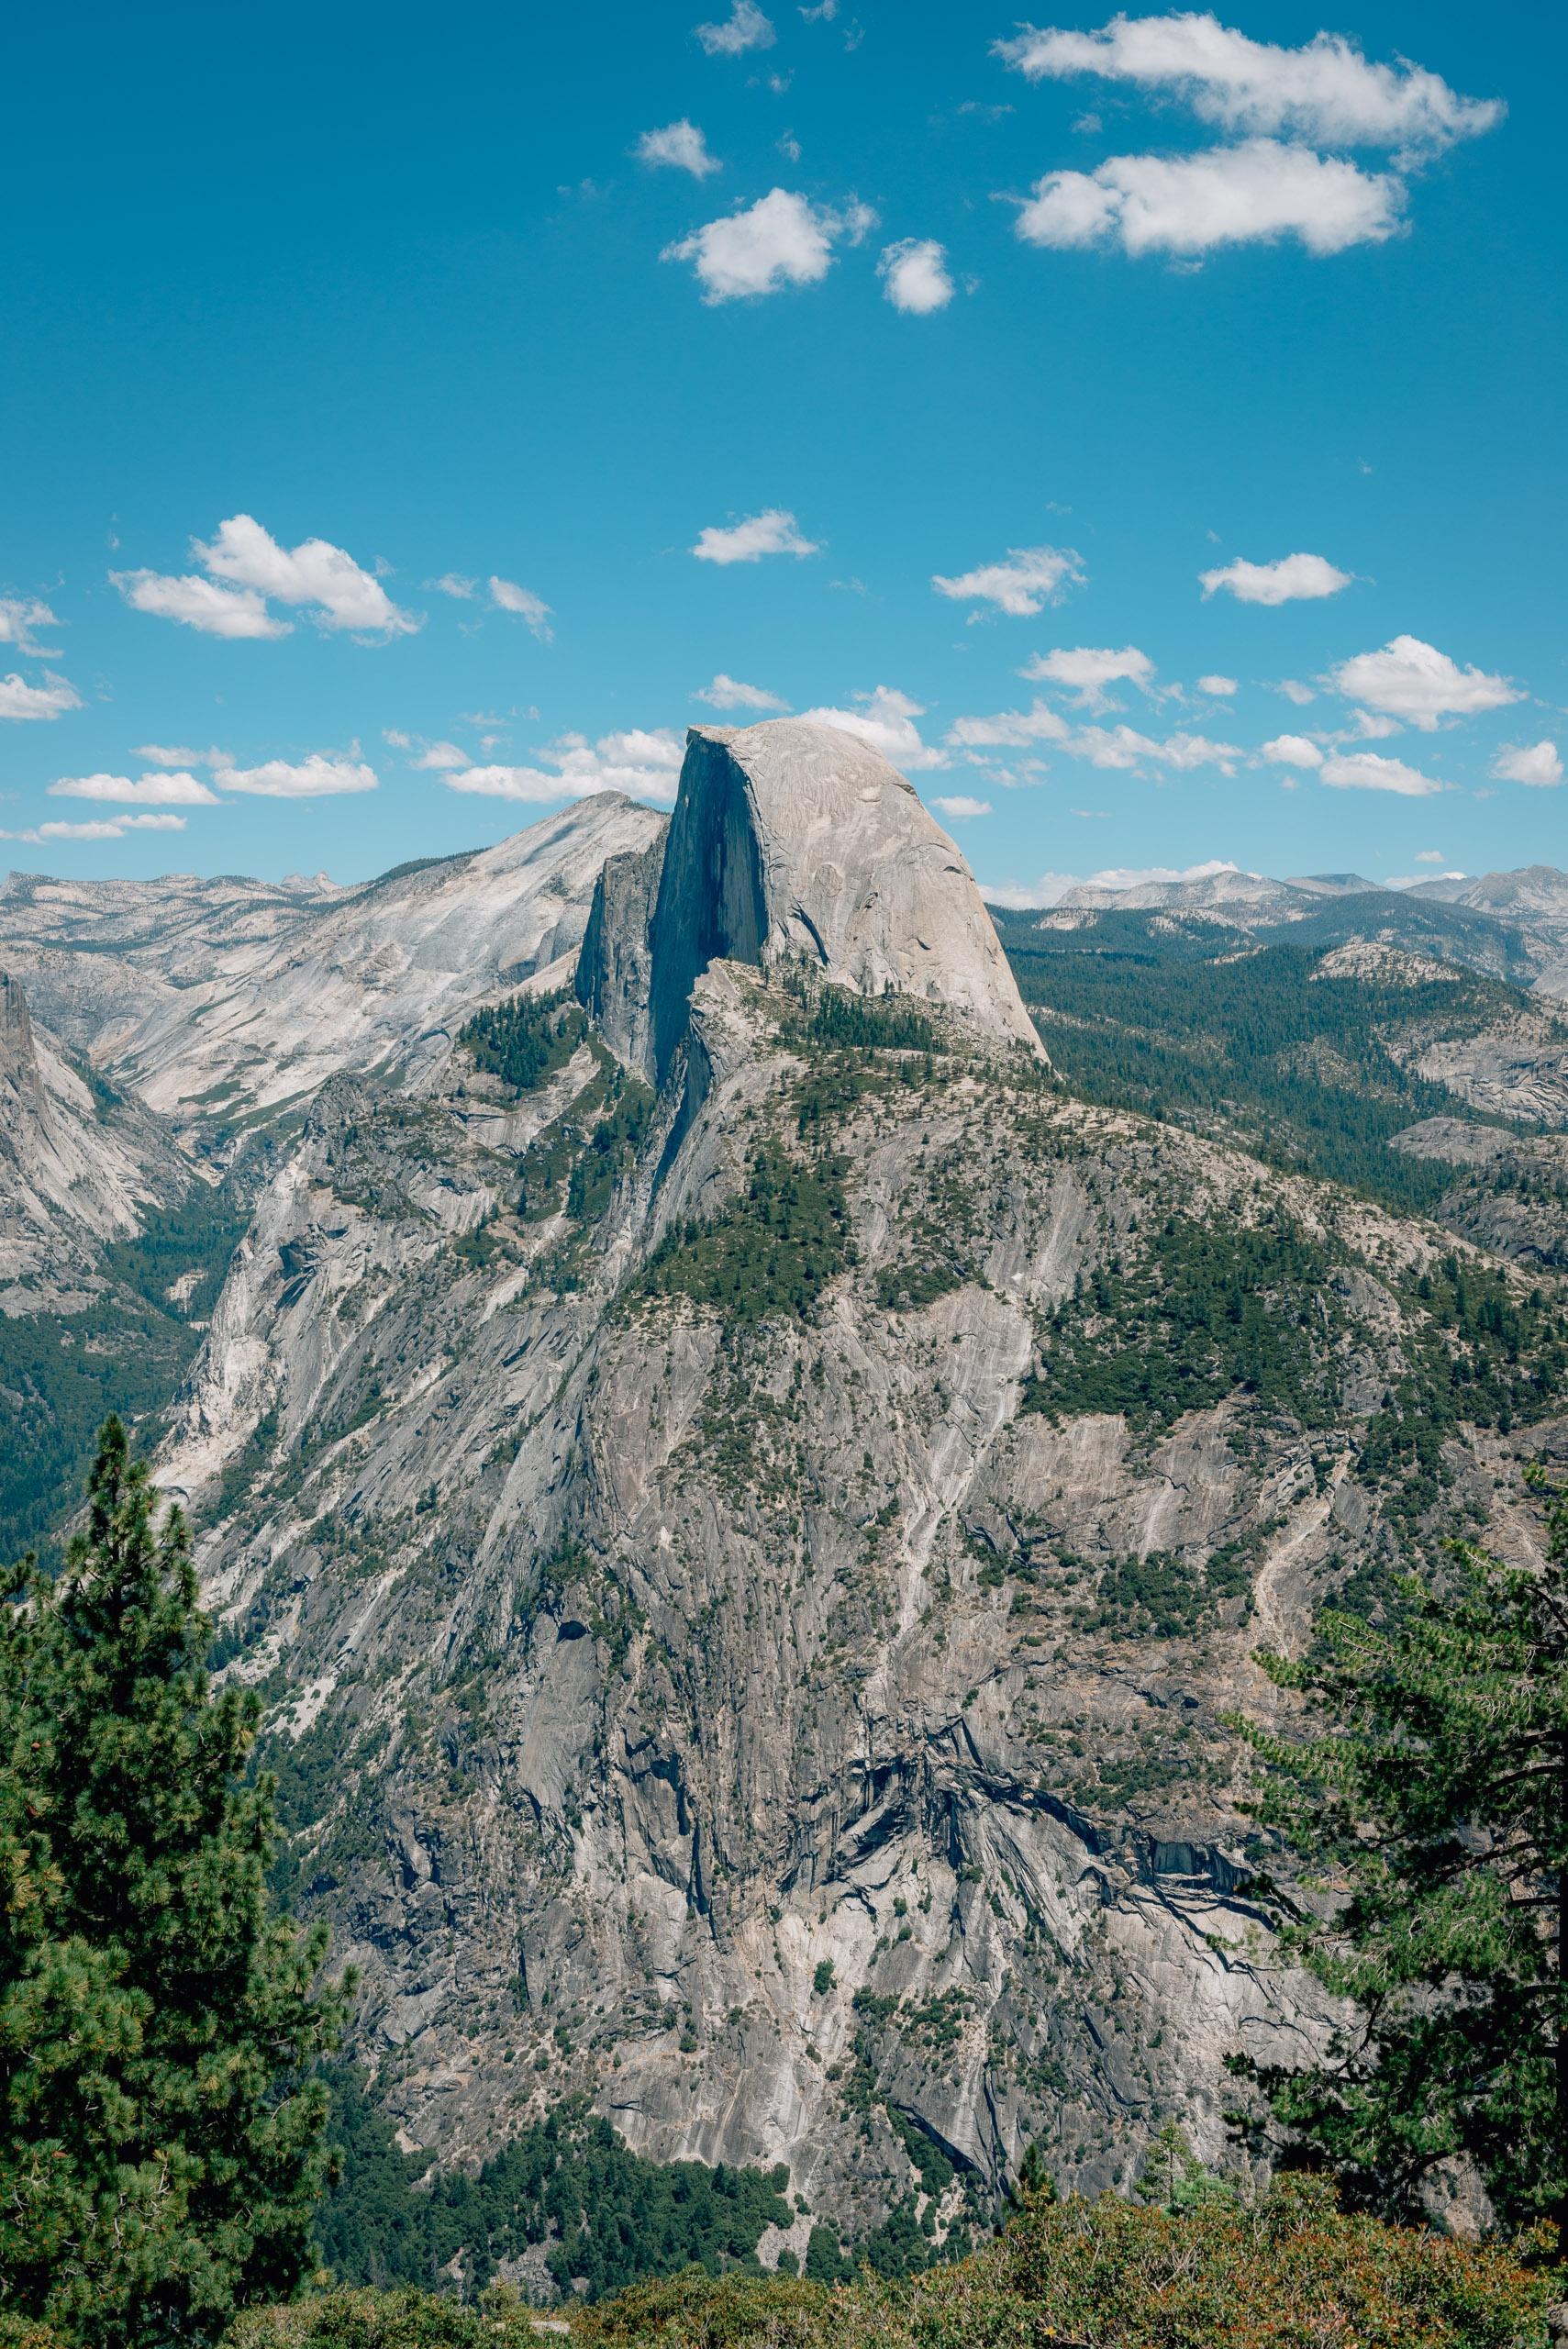 Yosemite National Park - 2012 - 2012-0721-DSC_0164_57198